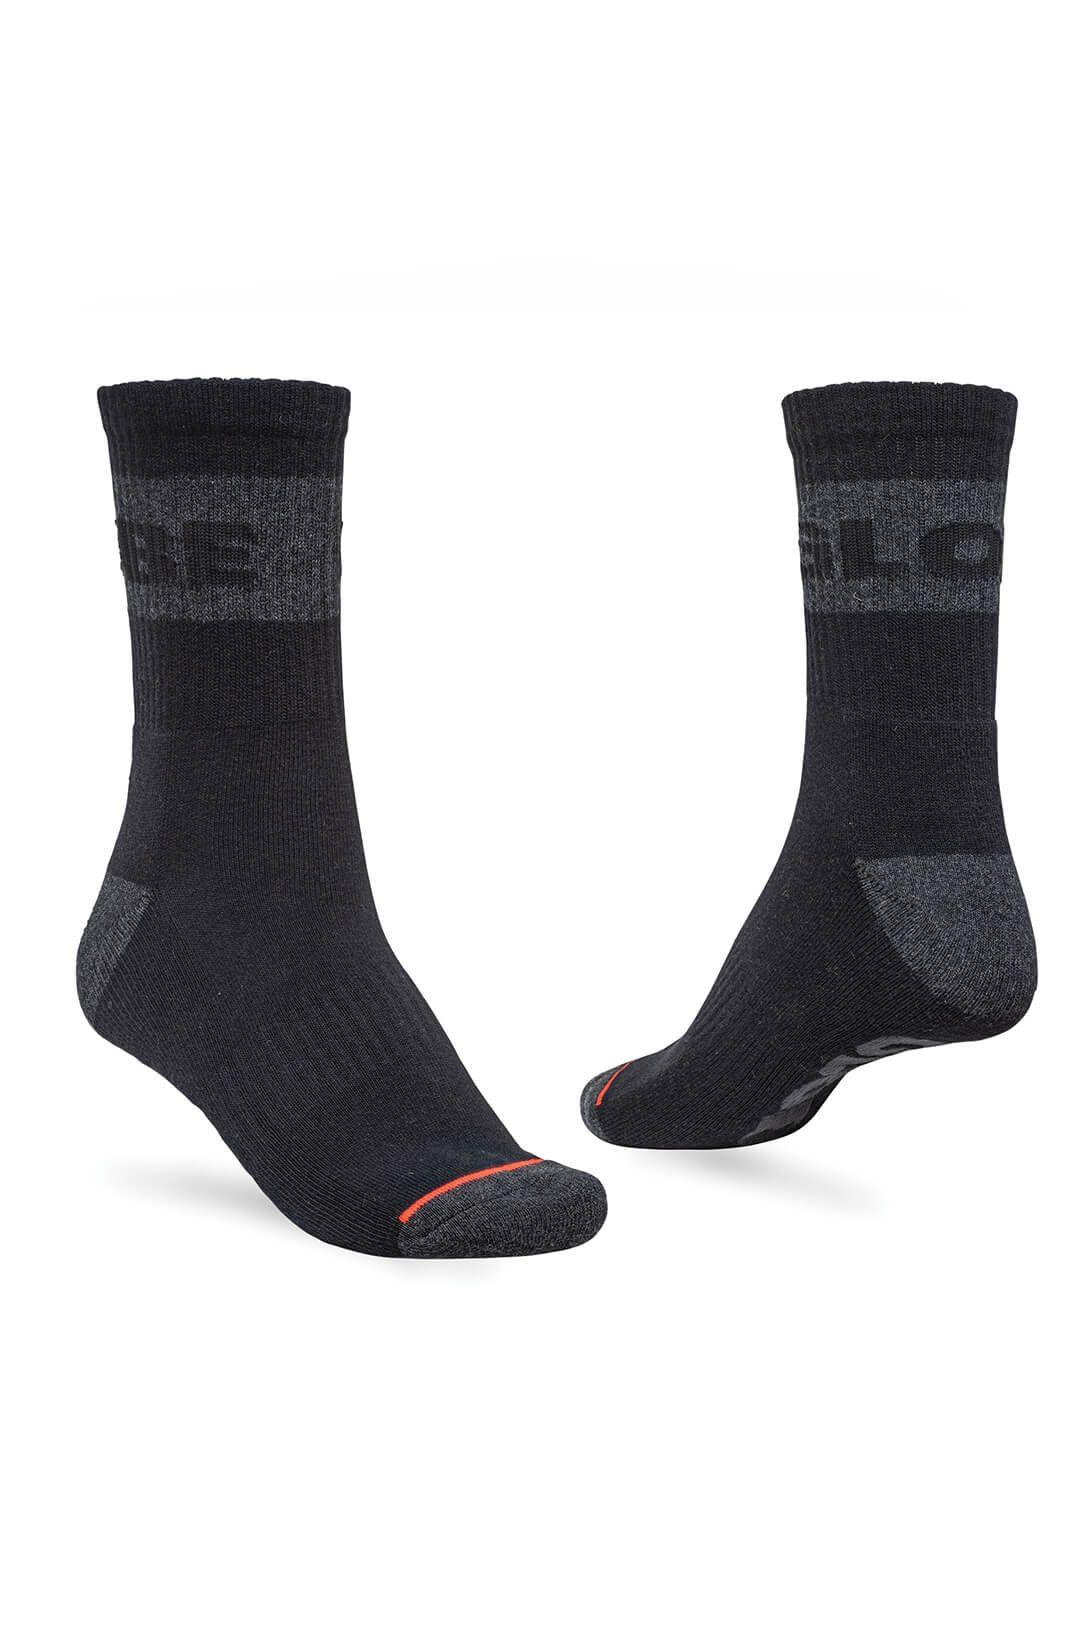 Globe Socks HORIZONS CREW SOCK 5 PACK Dark Assorted